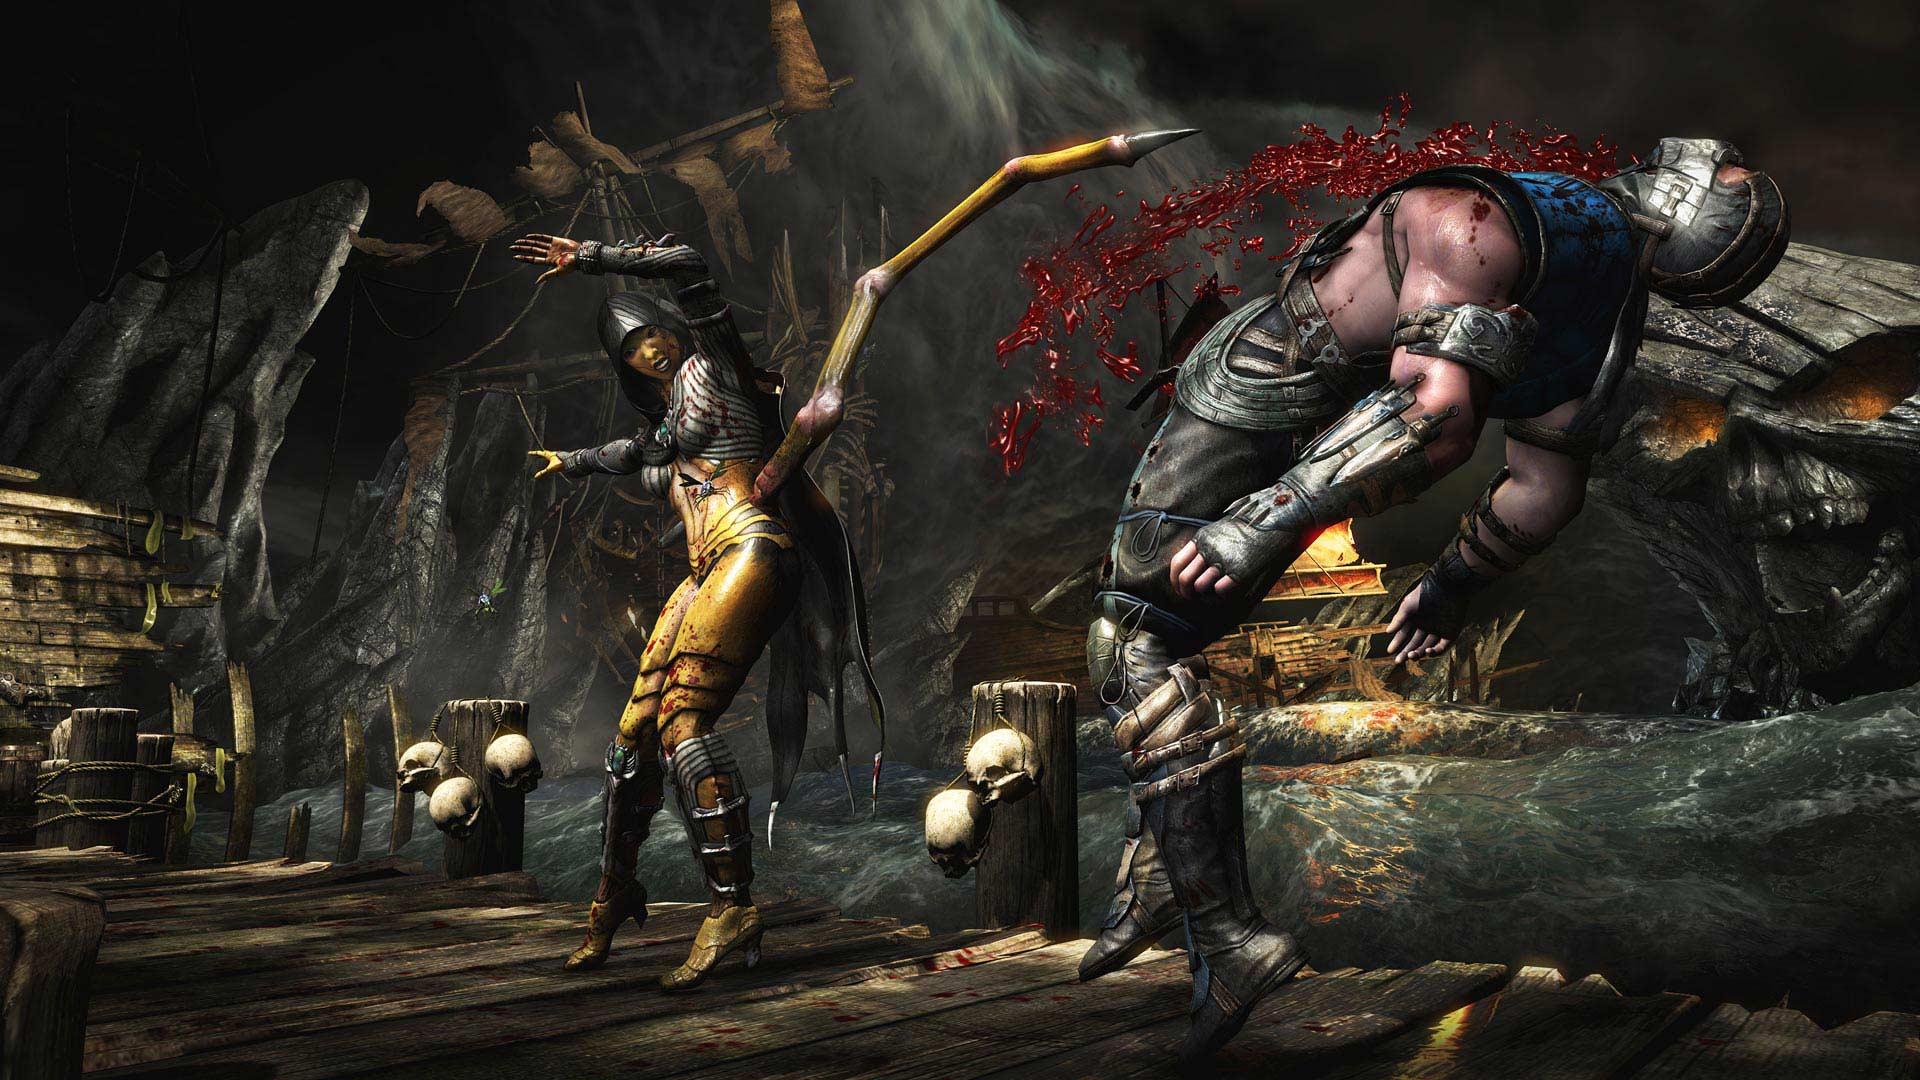 Купить Mortal Kombat X + подарок + бонус + скидка [STEAM]